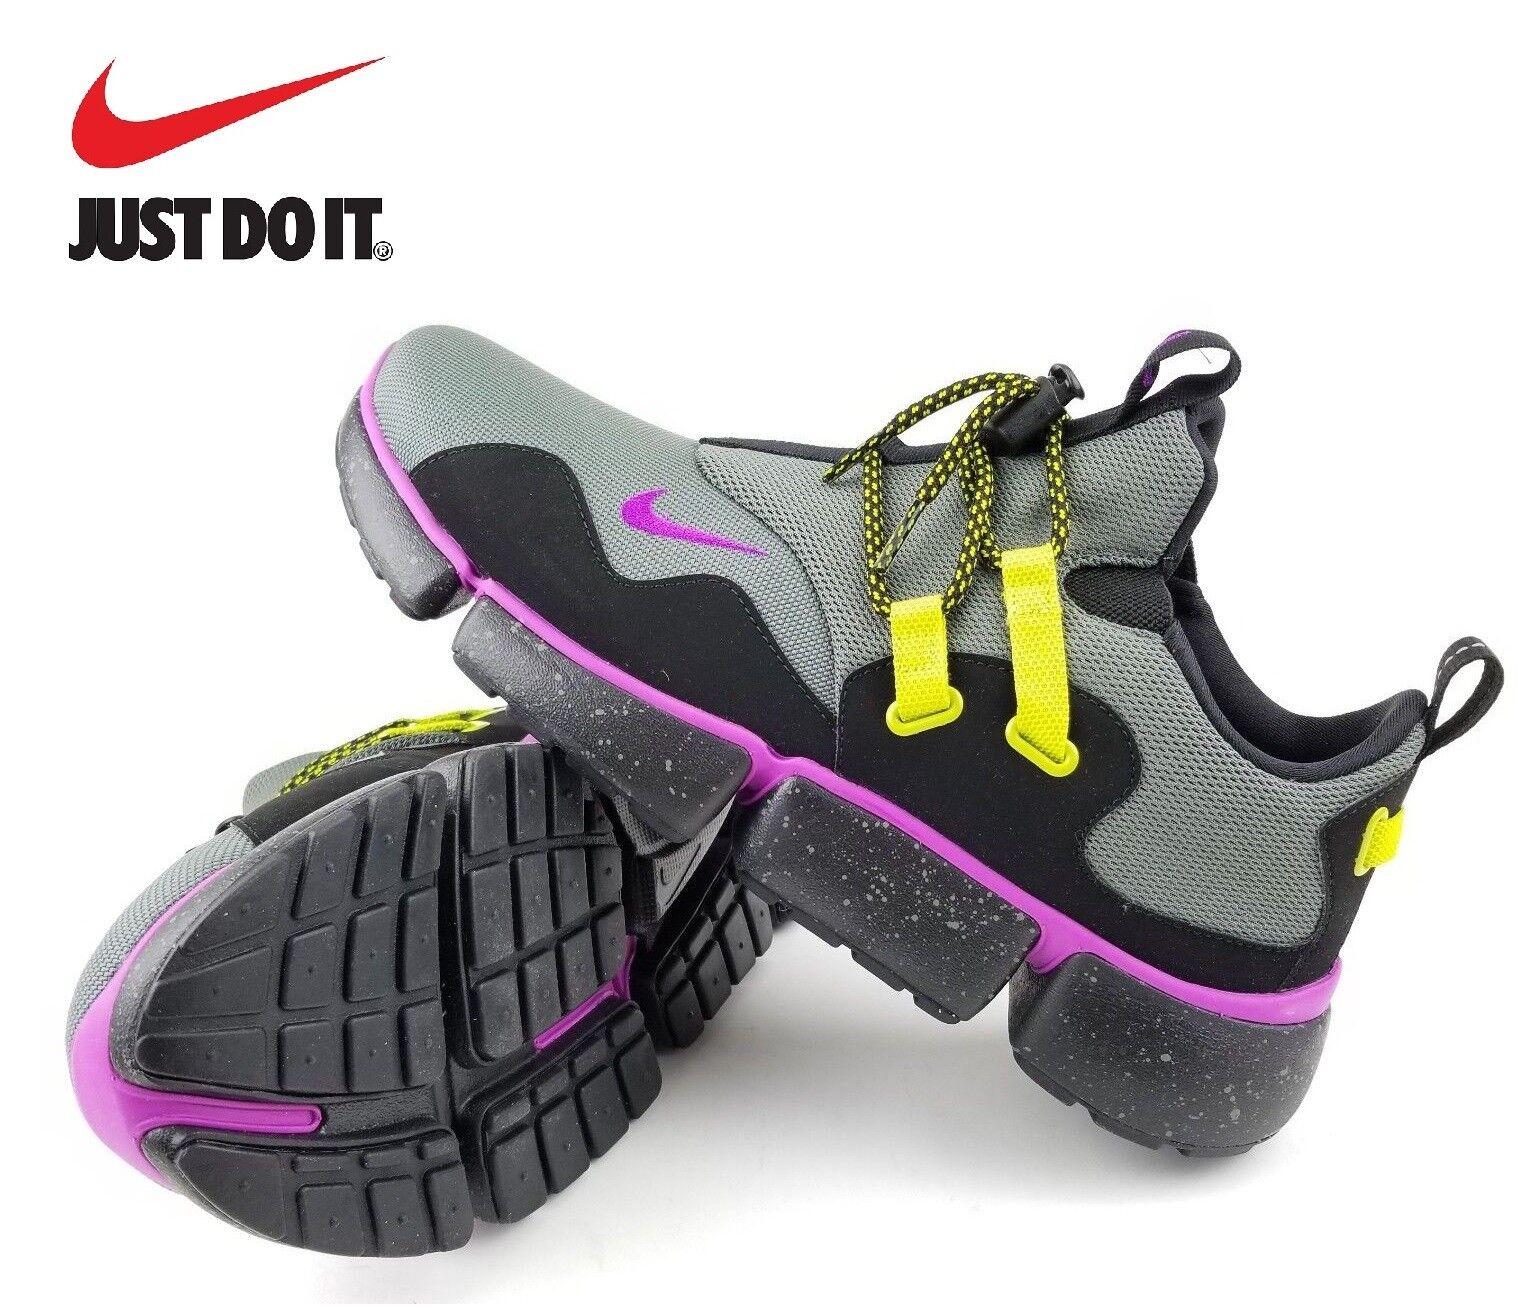 NIKE - Pocketknife DM SU Violet/Nero Athletic Shoes/ Uomo 7.5 NEW+BOX